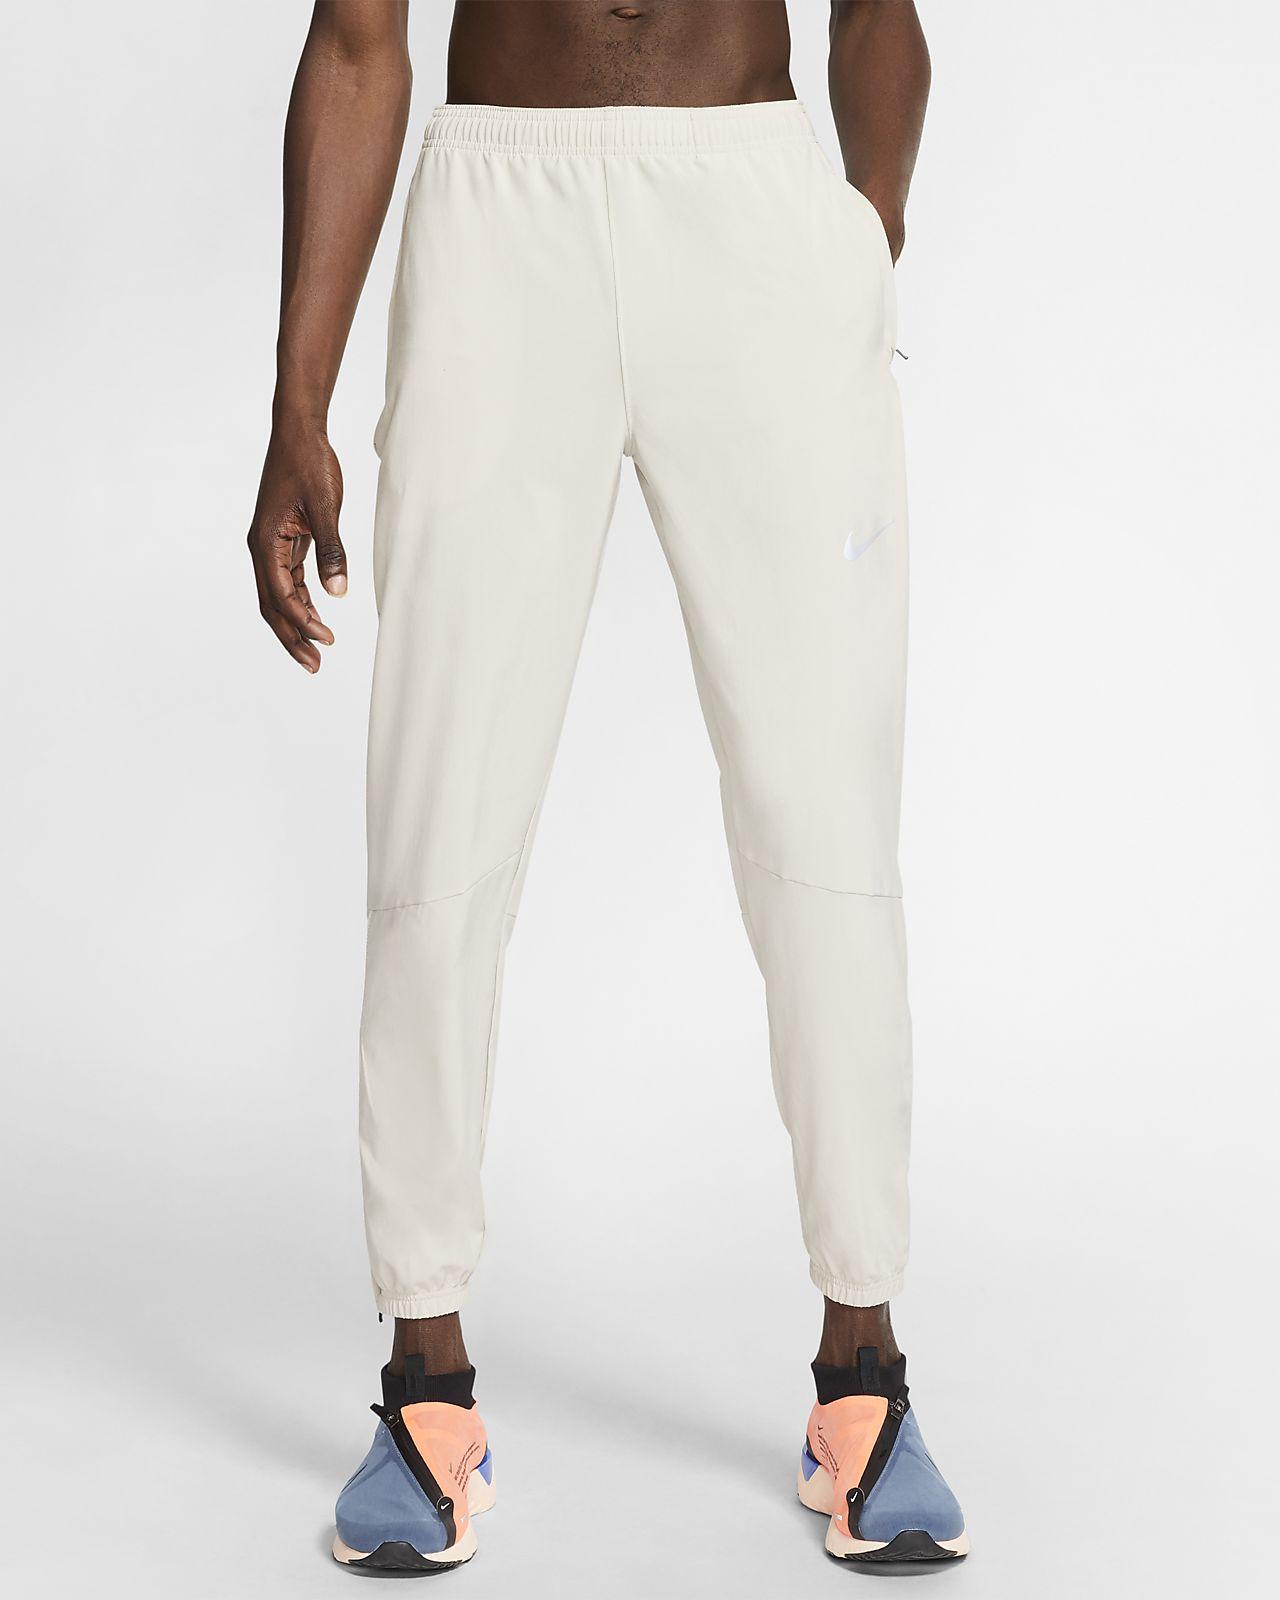 Nike Essential Men's Woven Running Pants